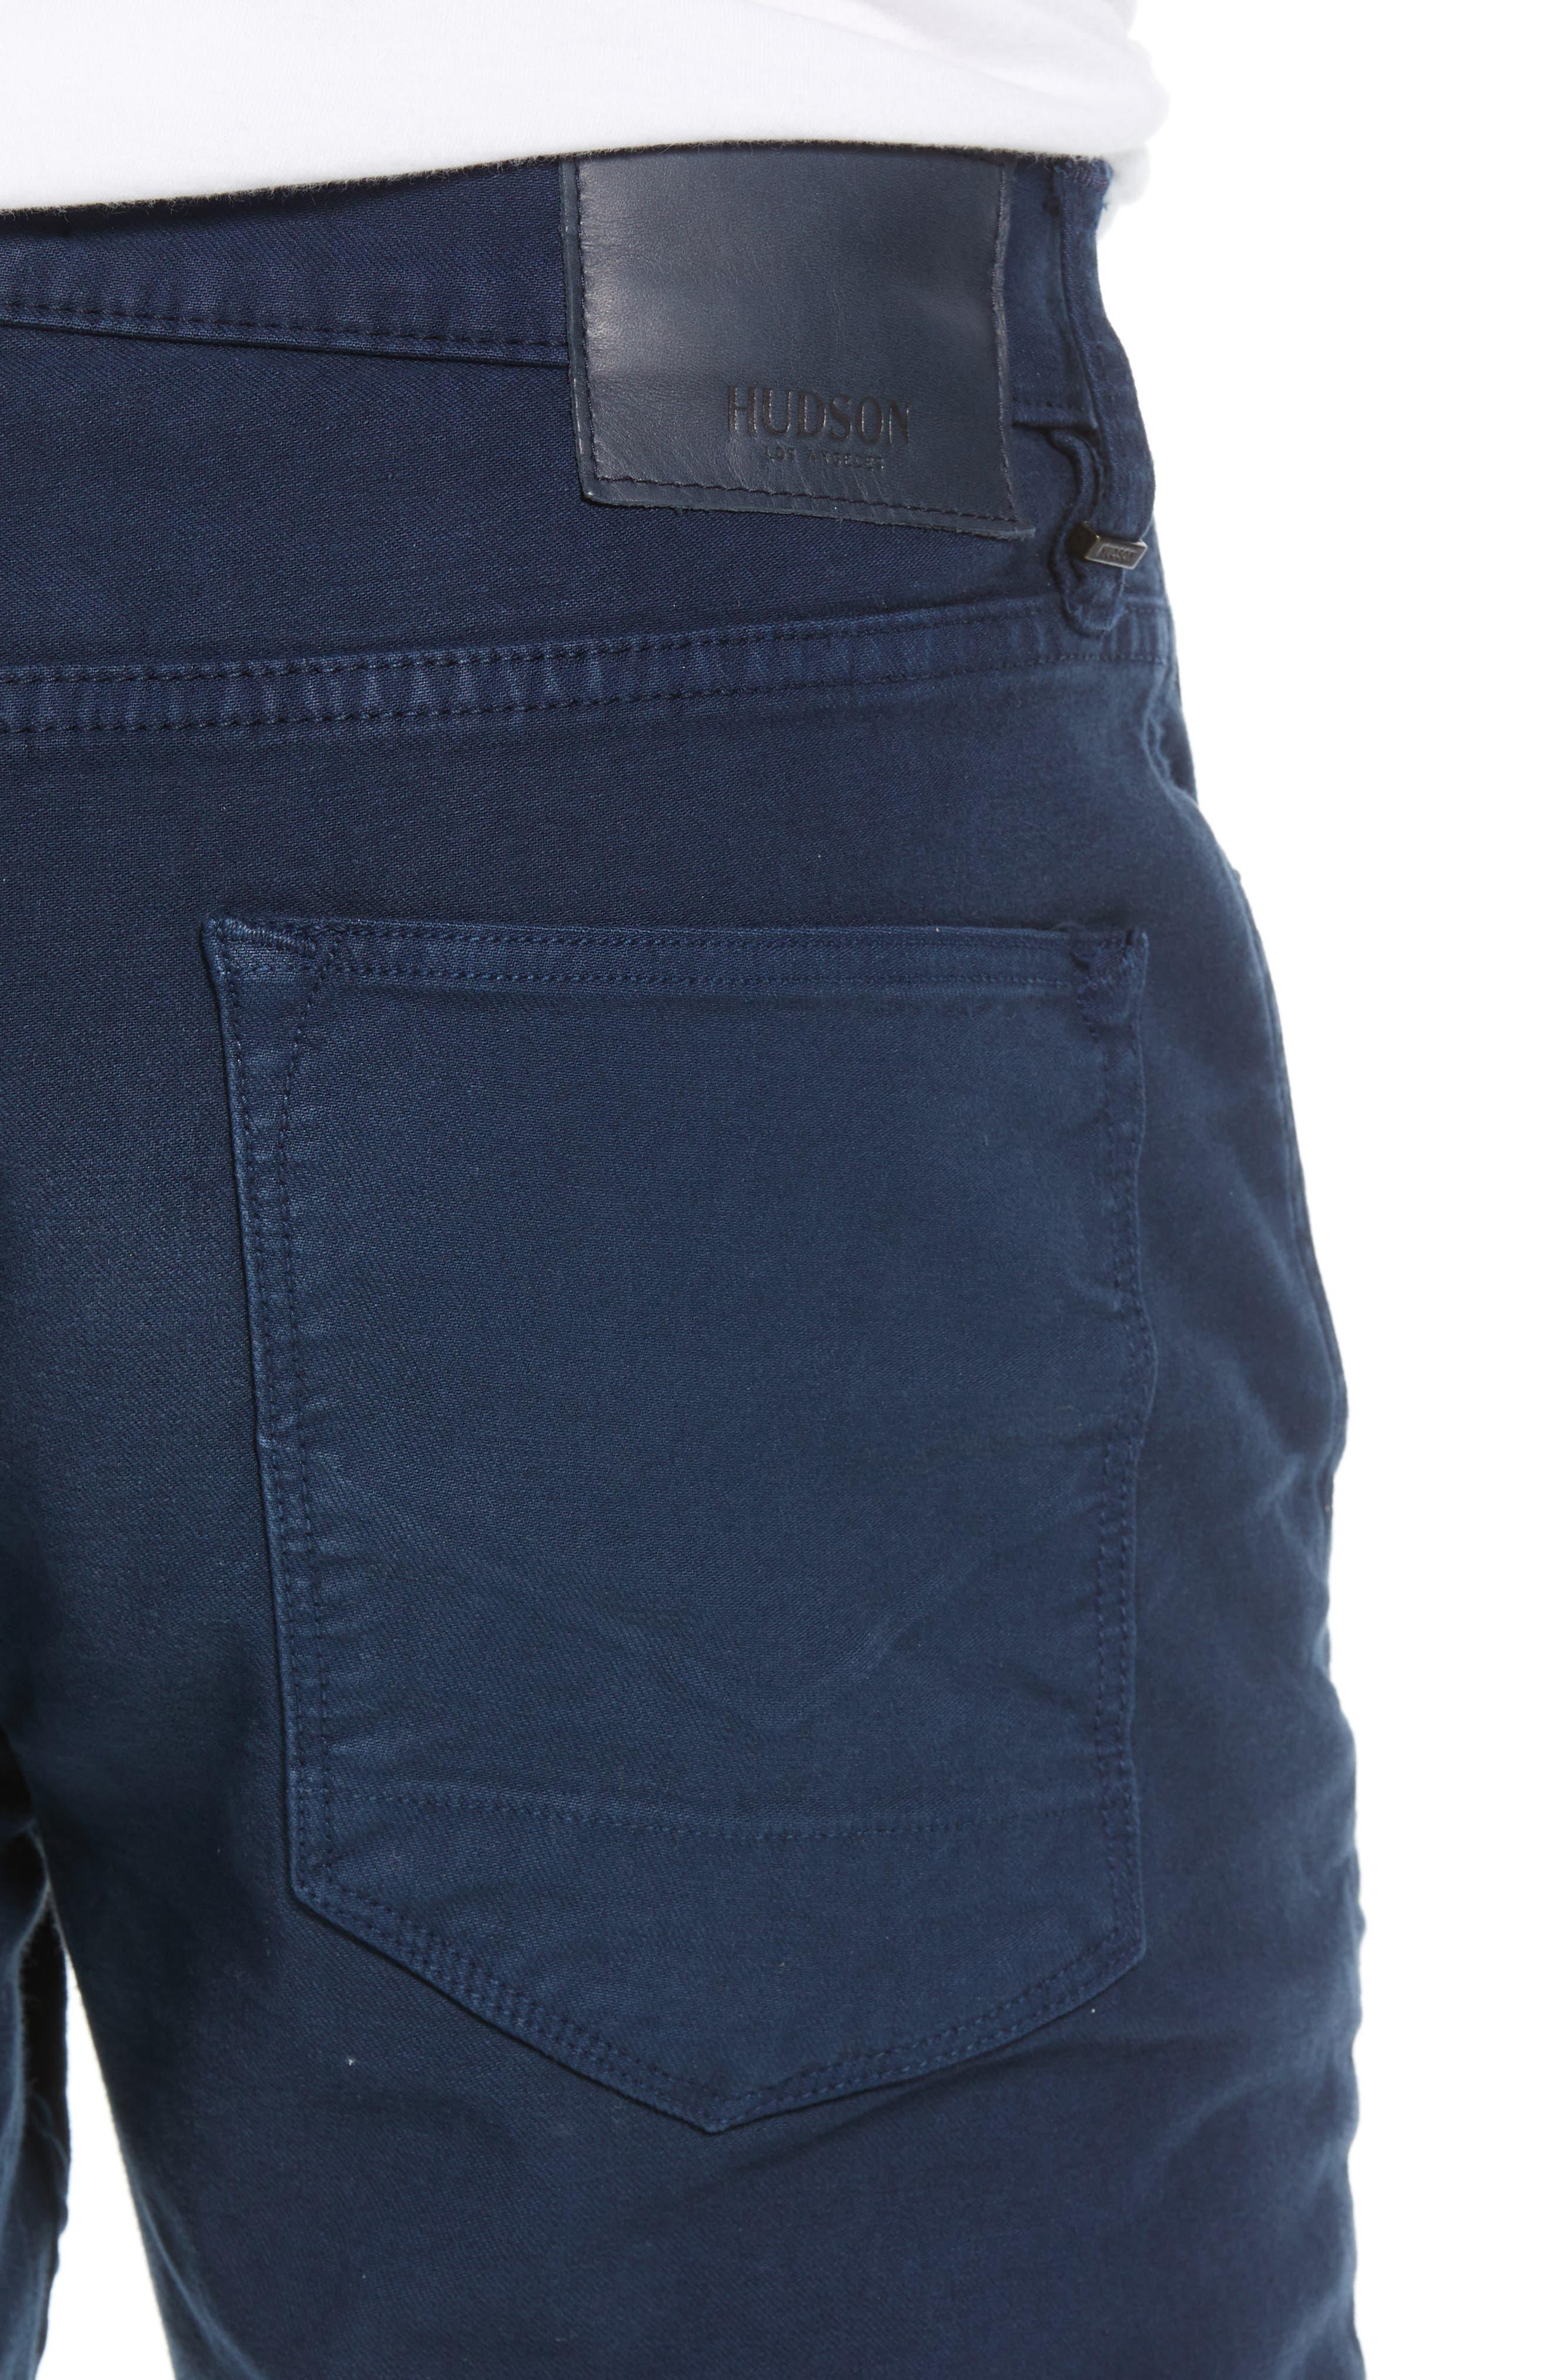 HUDSON JEANS, Axl Skinny Fit Jeans, Alternate thumbnail 4, color, SAILOR BLUE